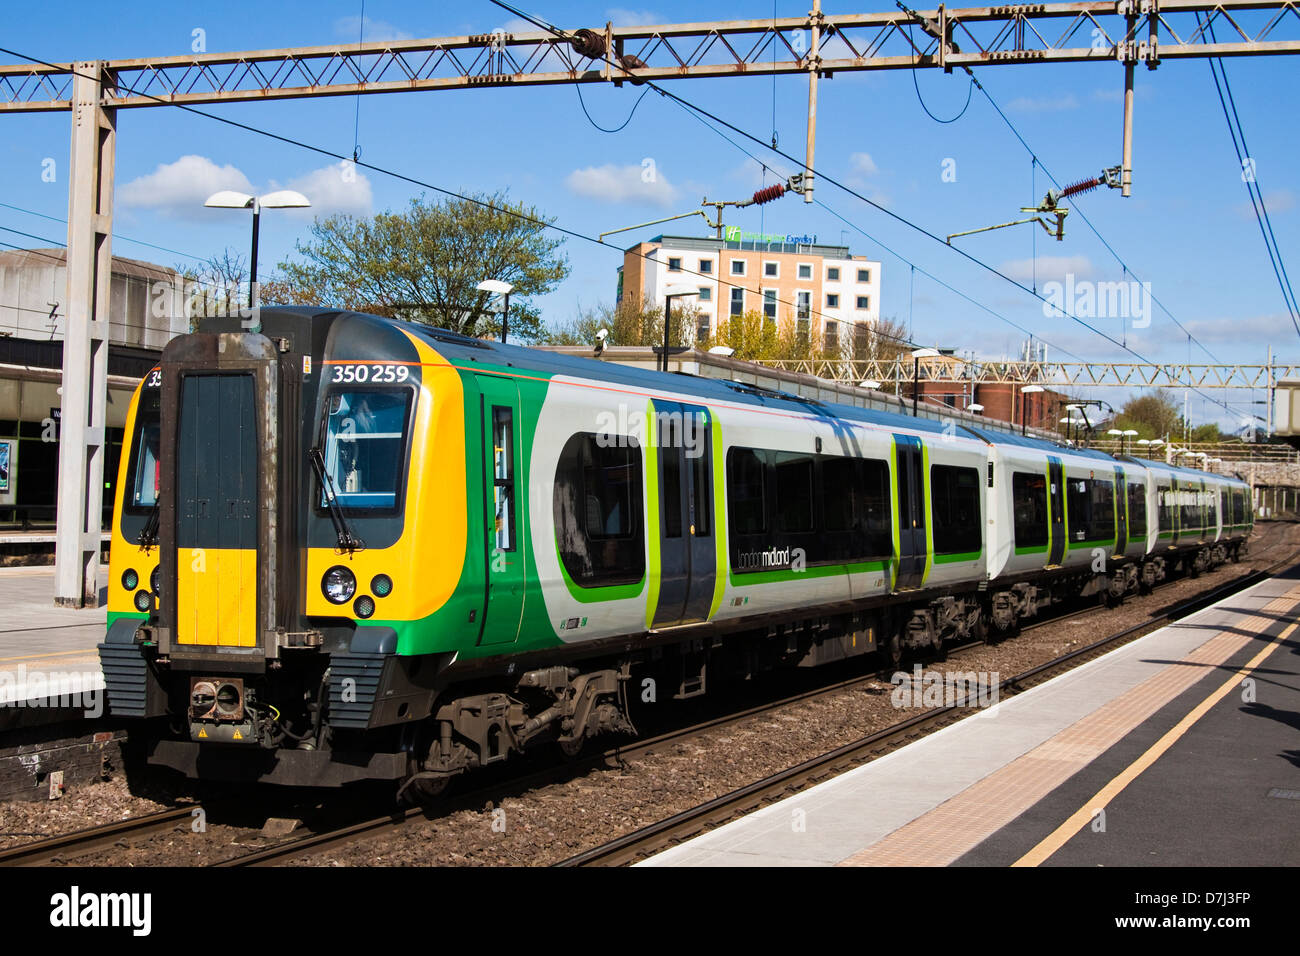 Watford junction railway station - Stock Image